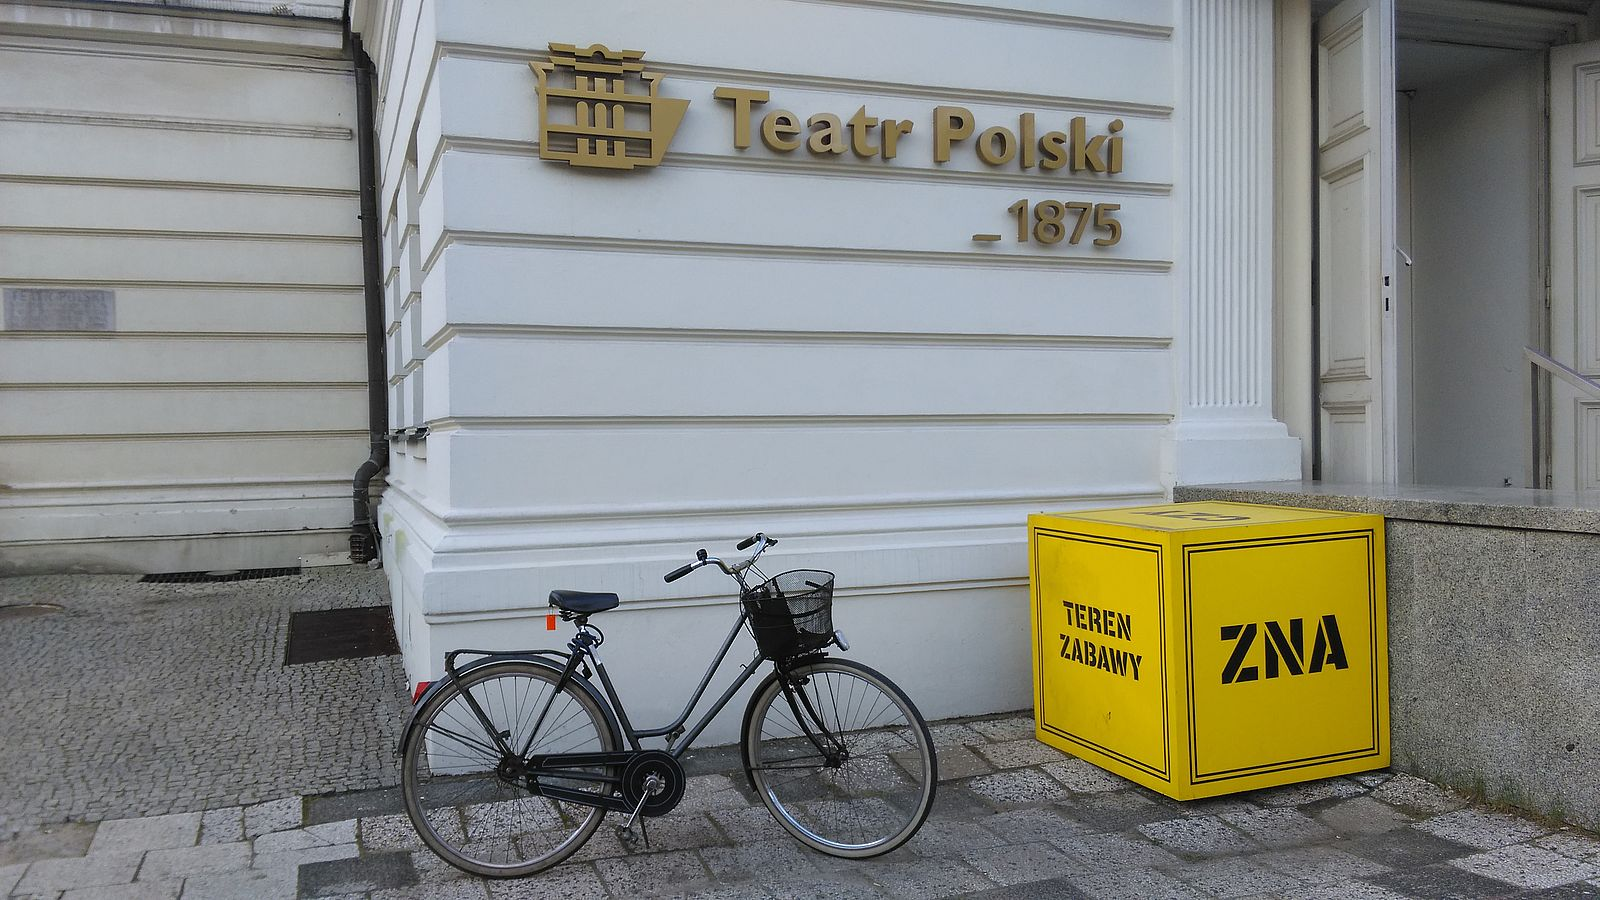 Teatr Polski  Foto: T. Dworek